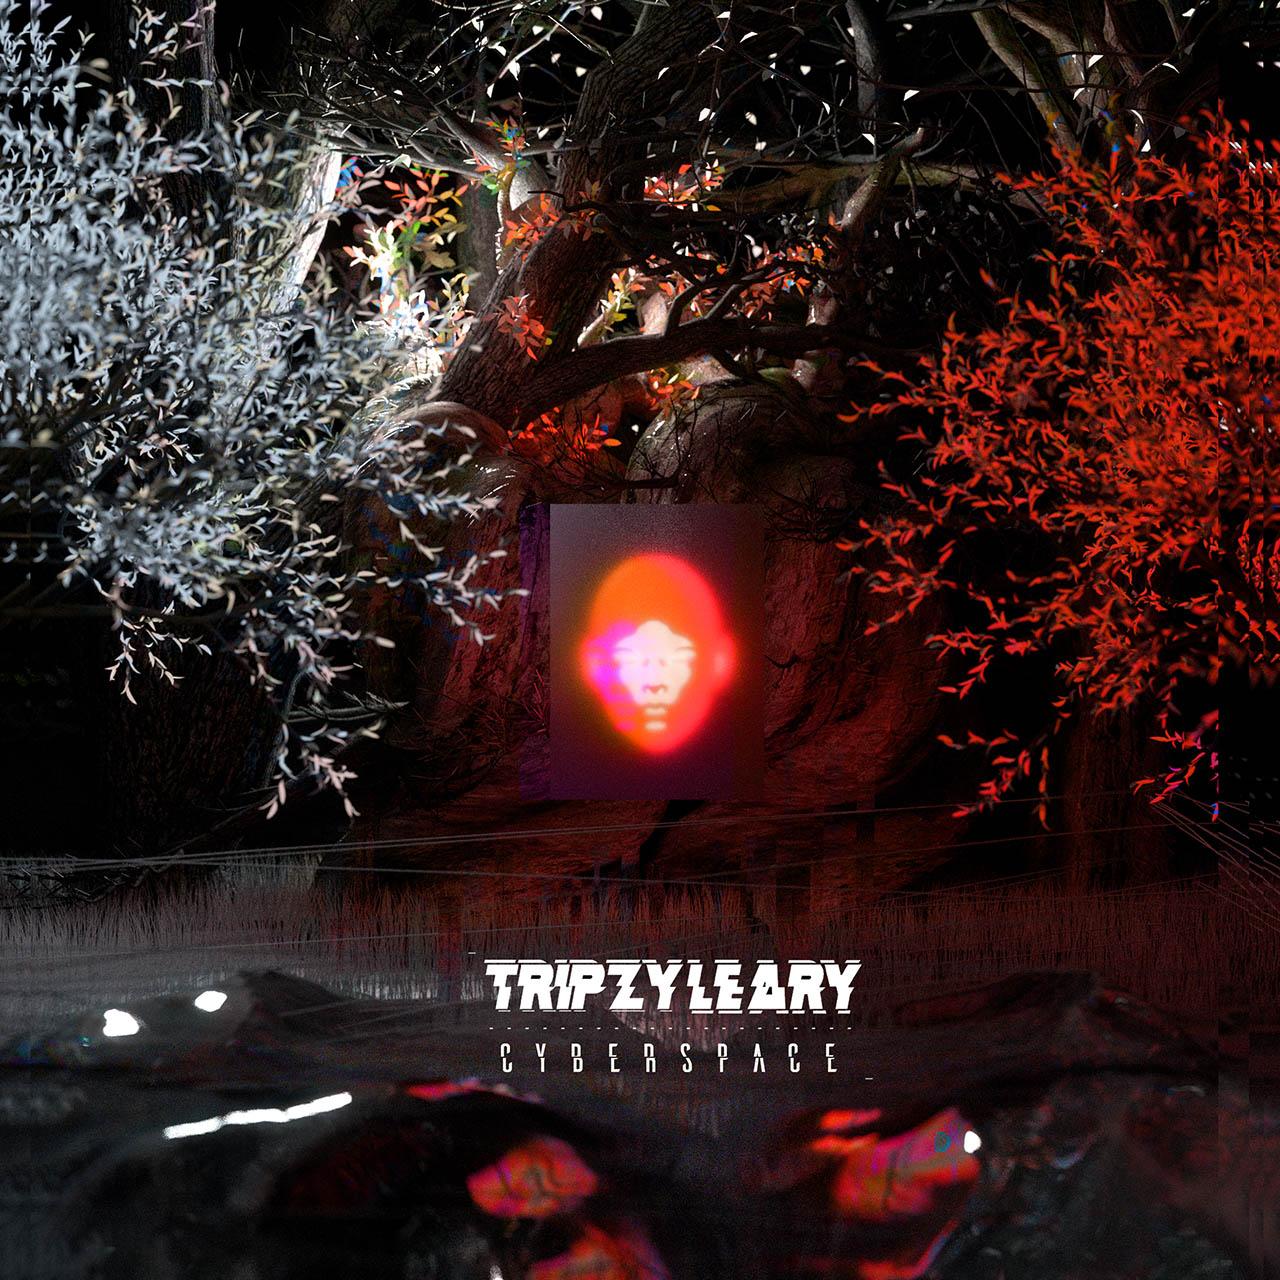 Tripzy Leary - Cyberspace album